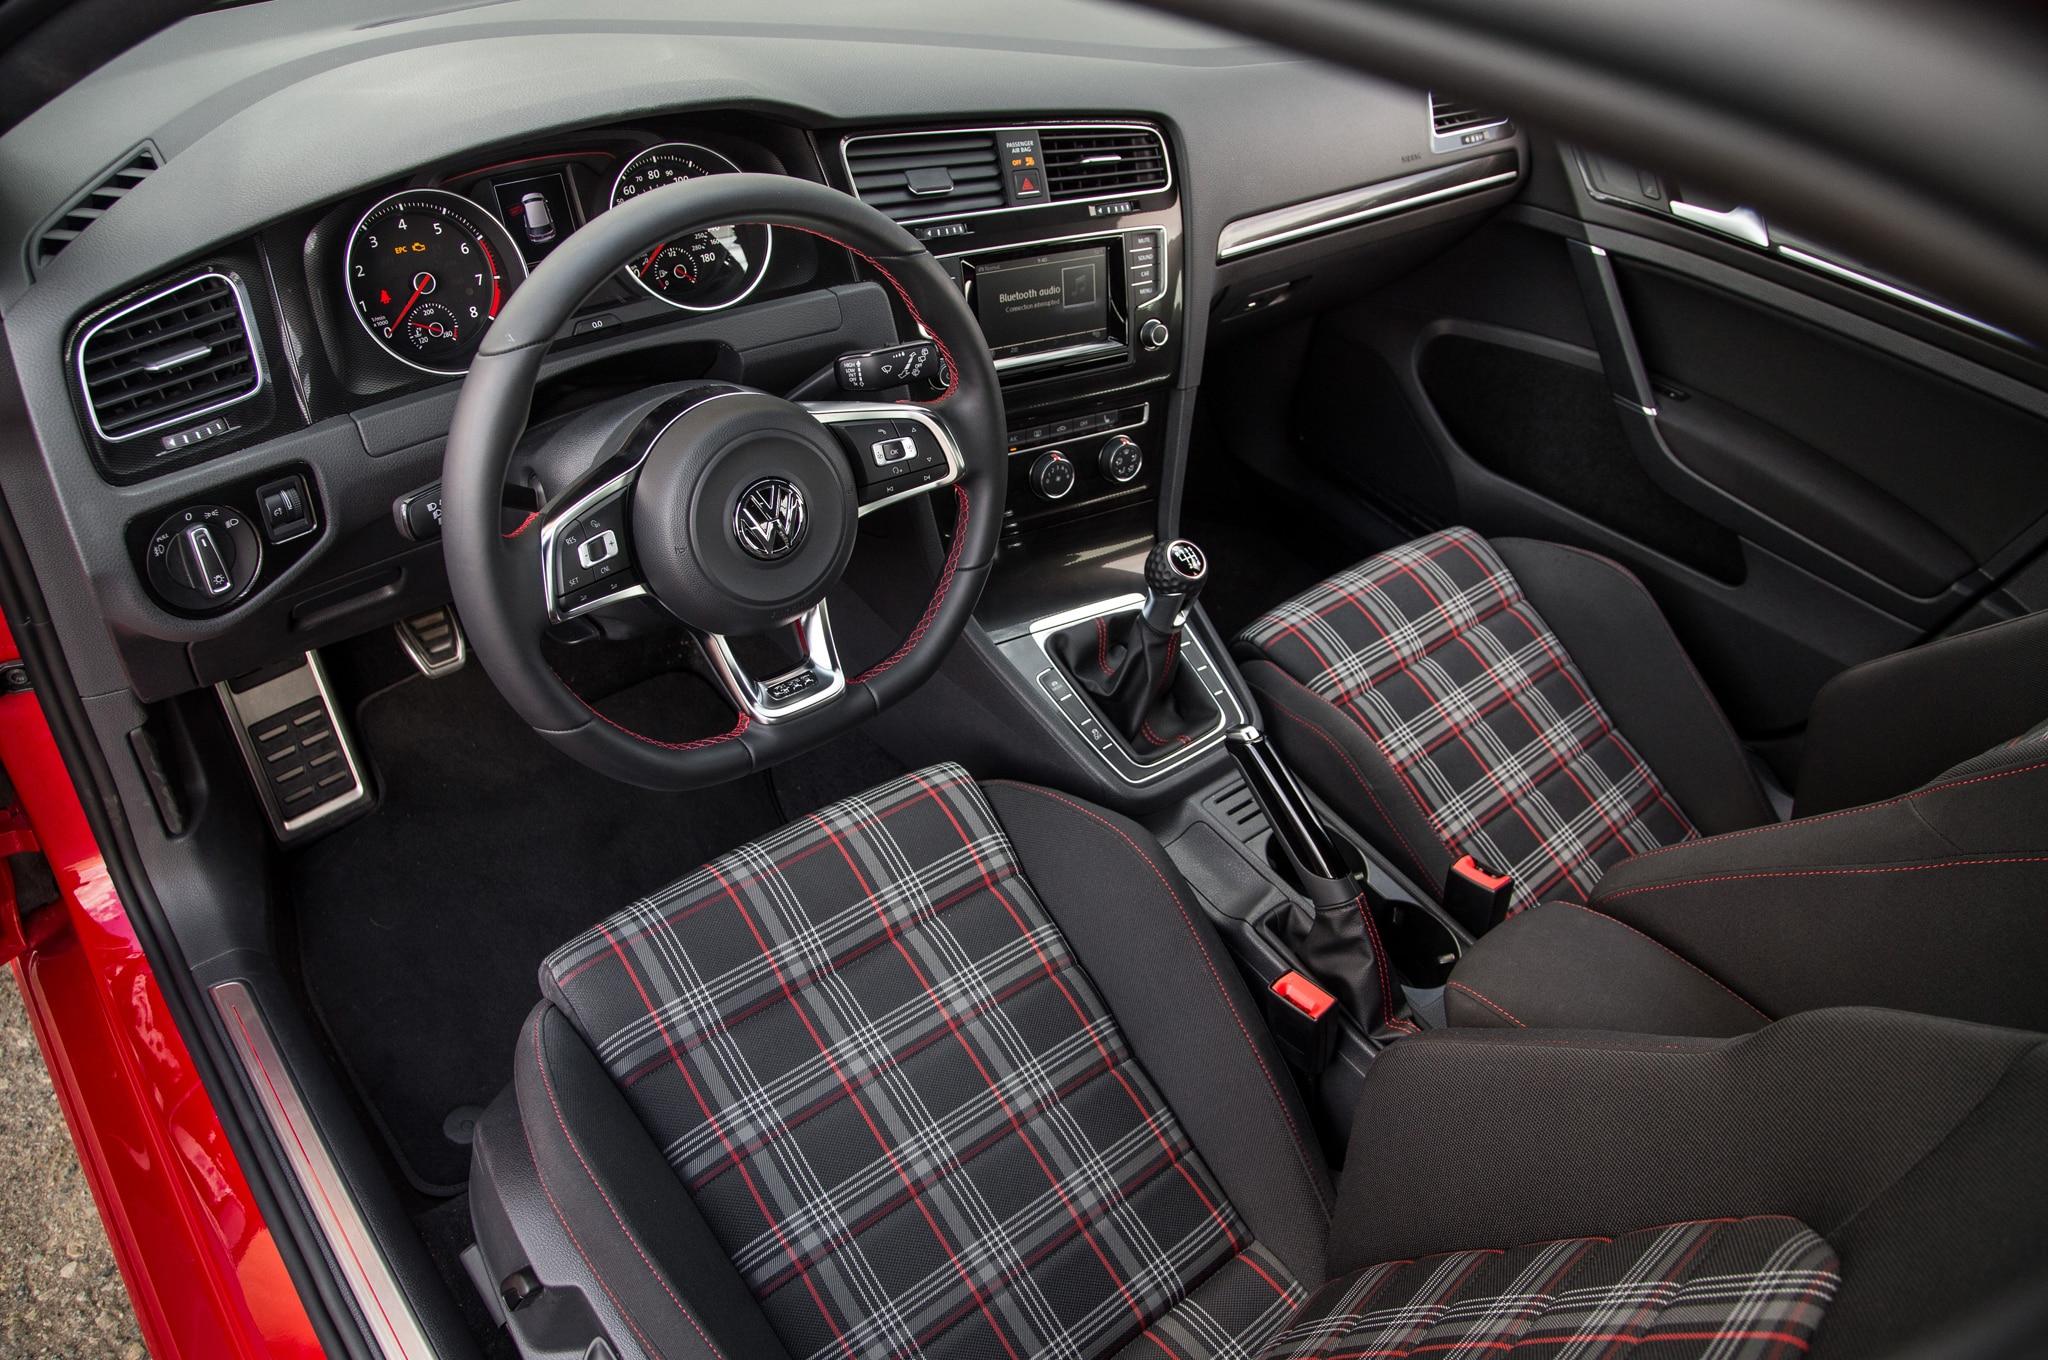 Volkswagen golf gti 2015 primera prueba for Interior volkswagen golf